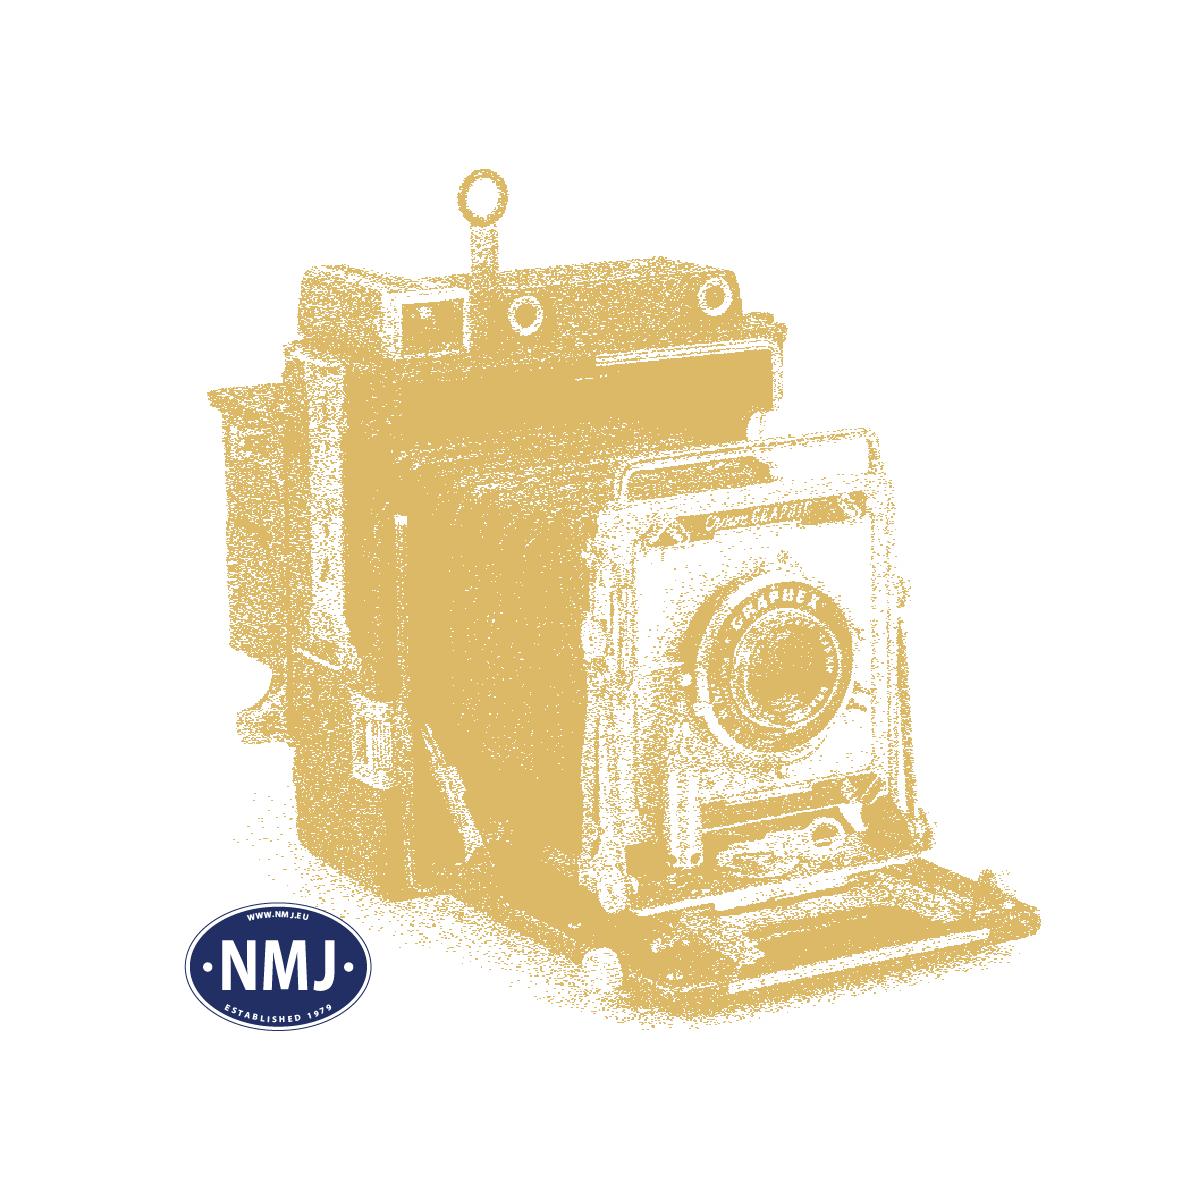 NMJT90304 - NMJ Topline CFL 1601 (1956-1971), DCC Sound